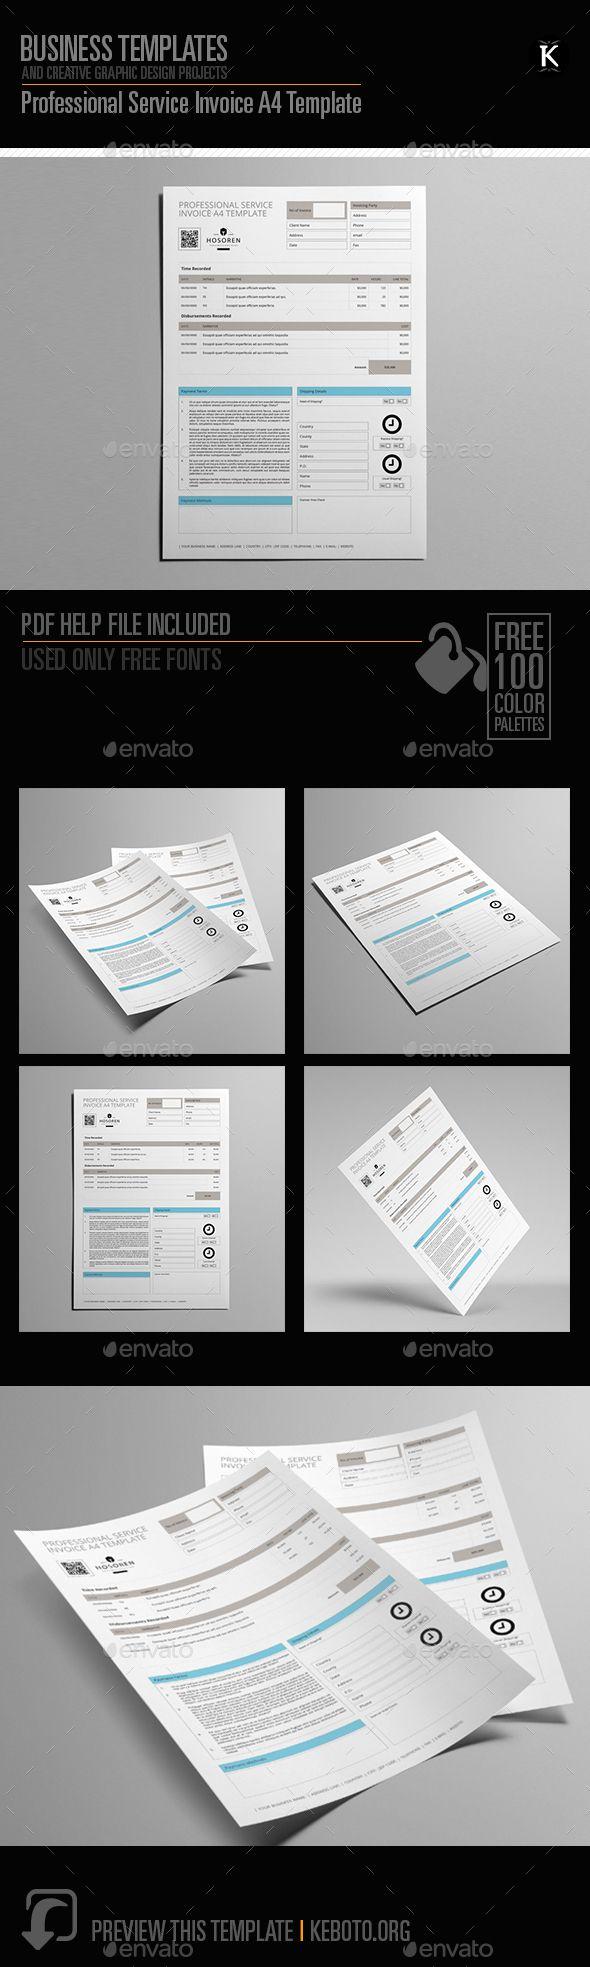 Professional Service #Invoice A4 Template - Miscellaneous Print Templates